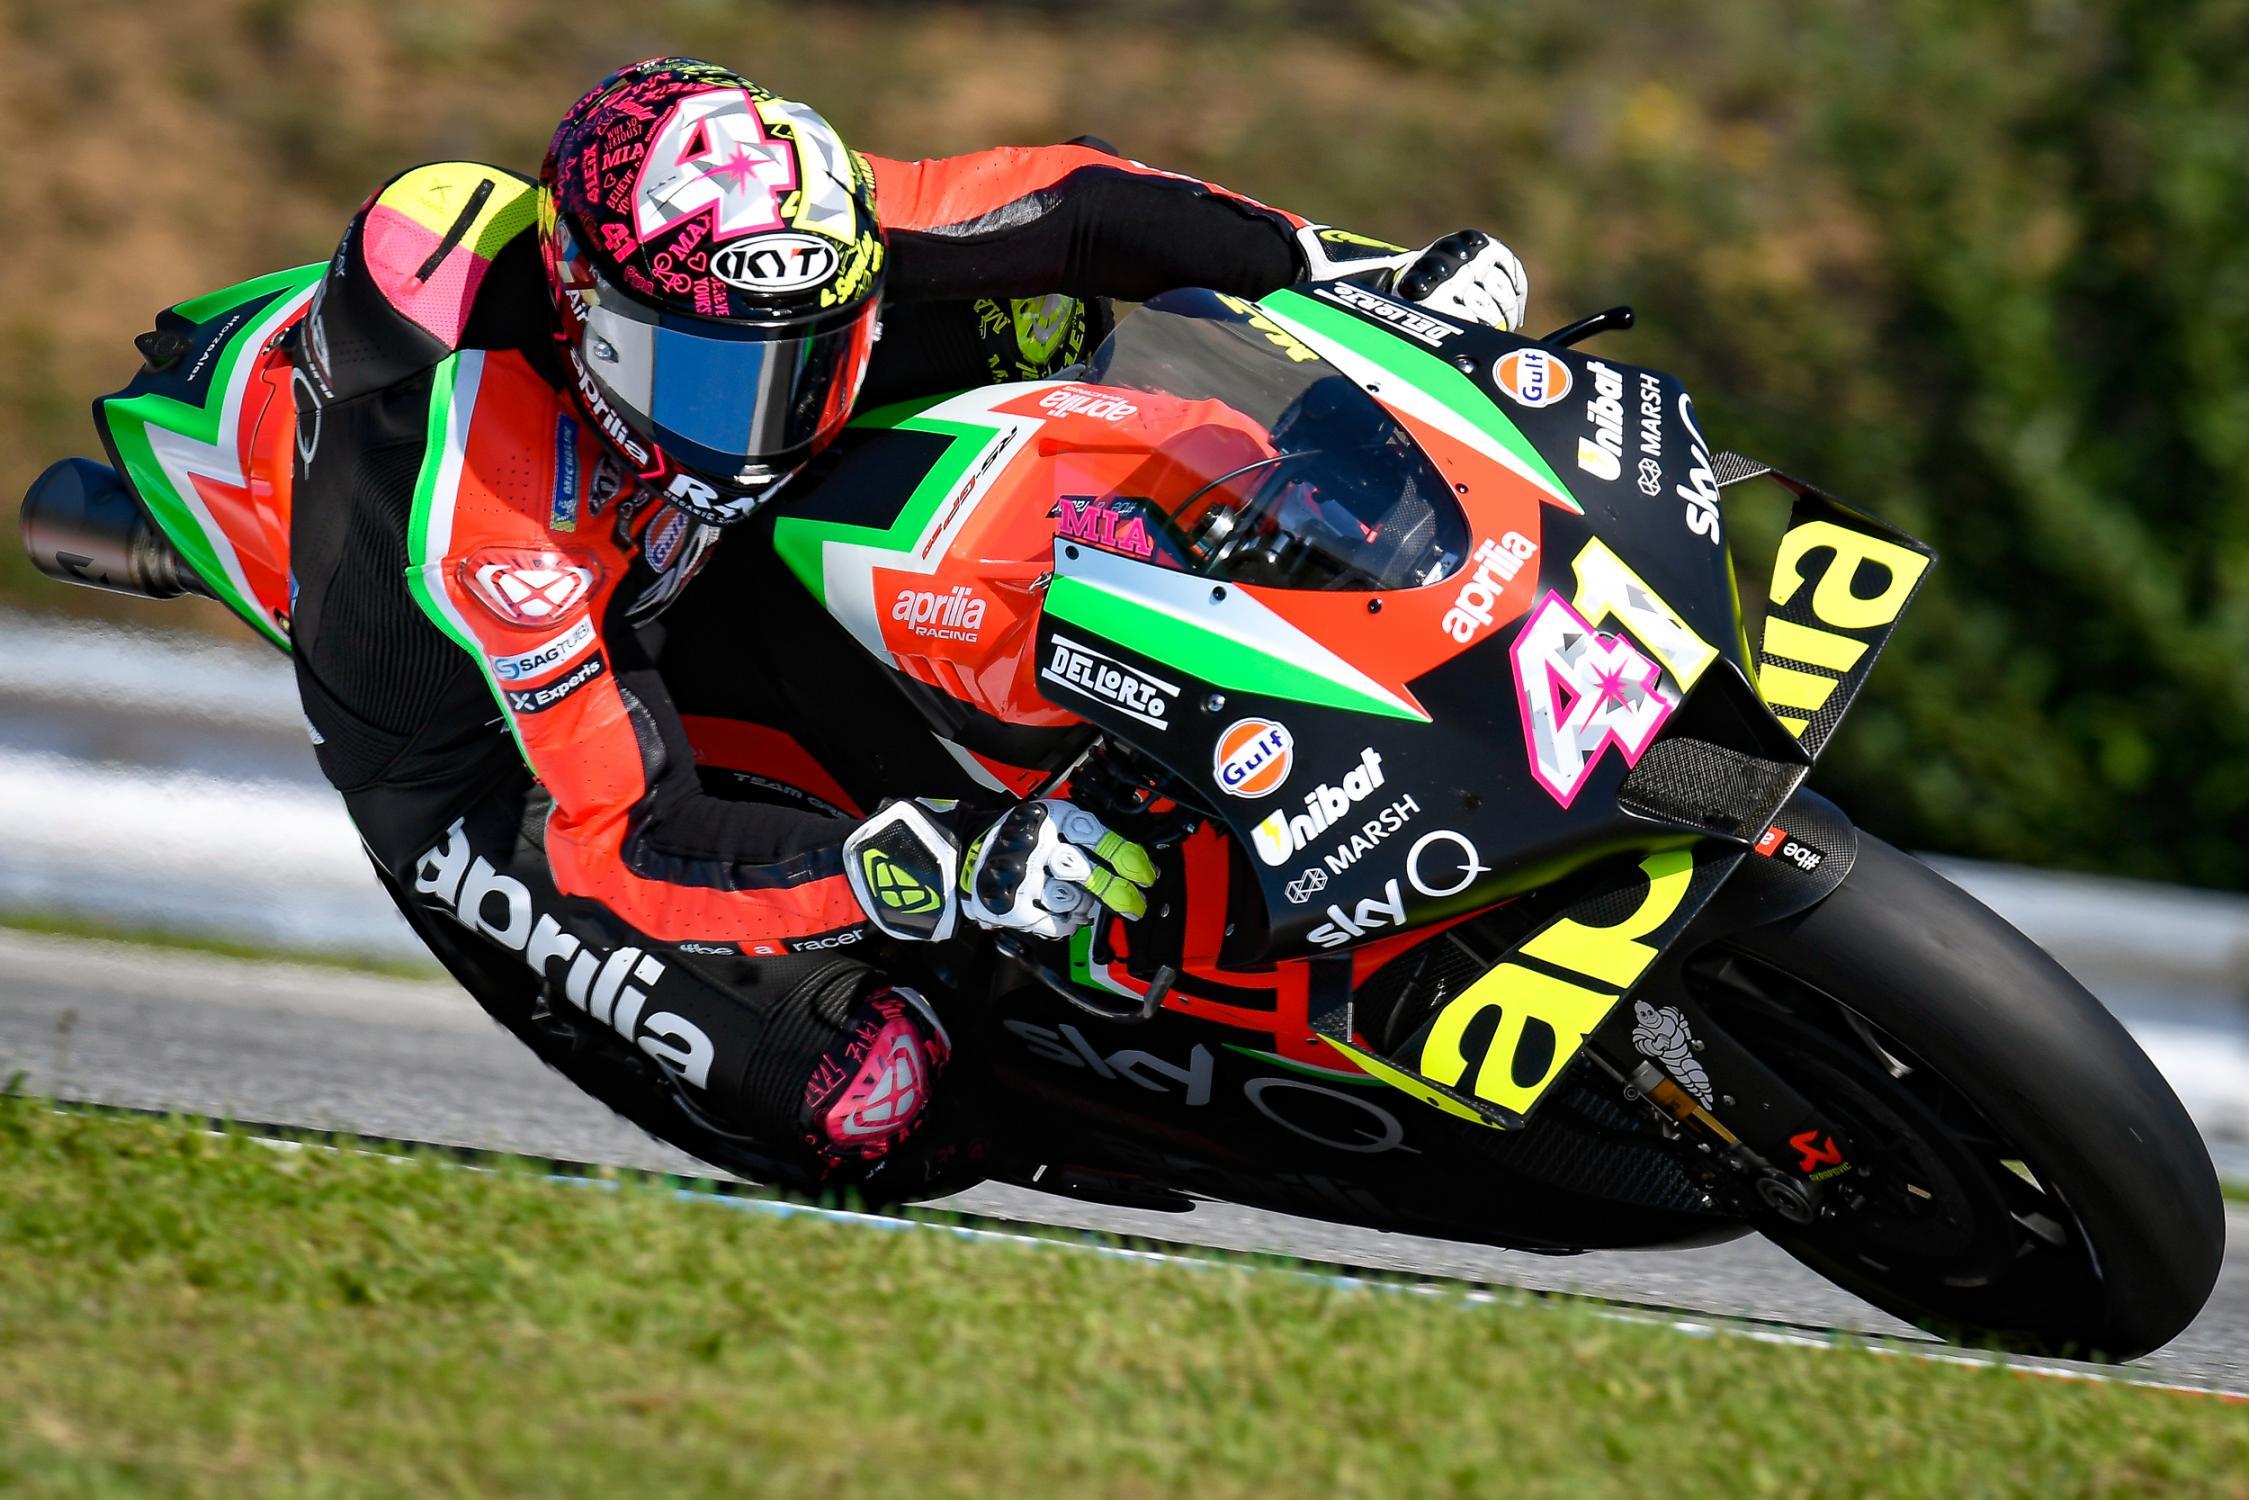 Aleix Espargaro - Moto GP